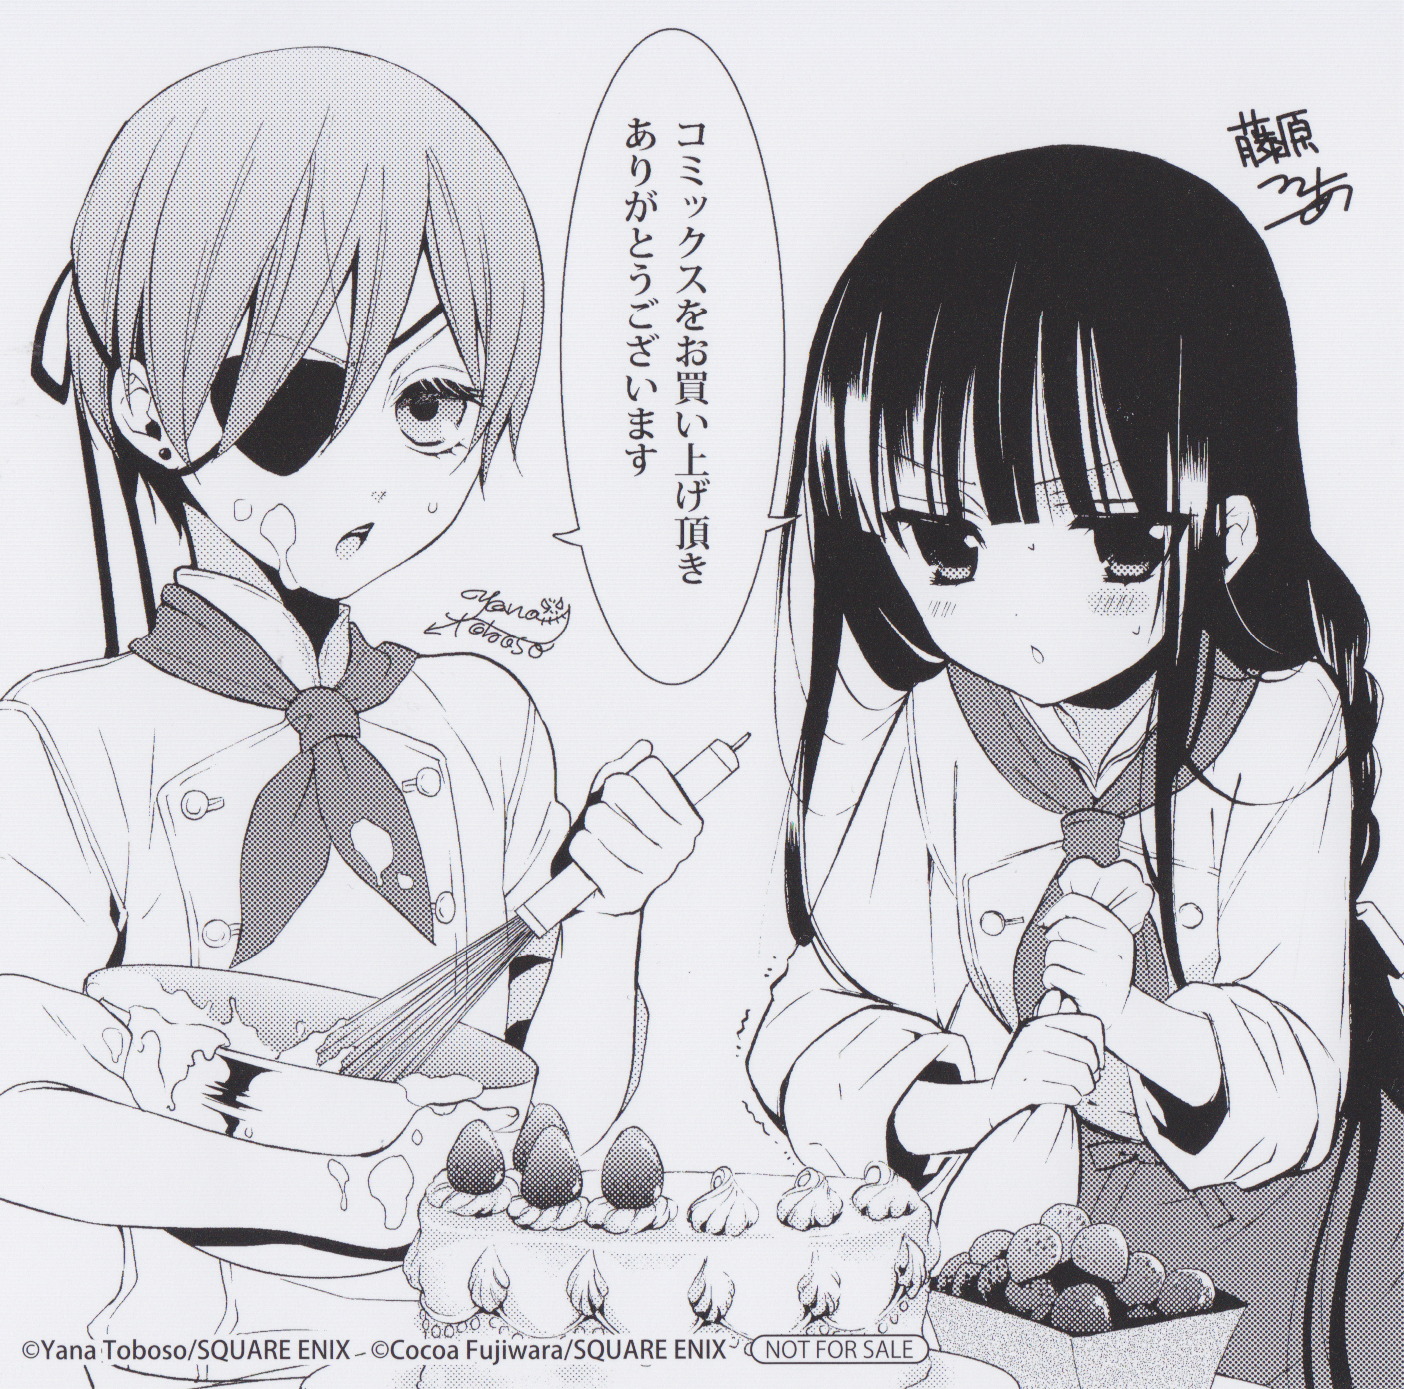 kuroshitsuji and Inu x boku ss